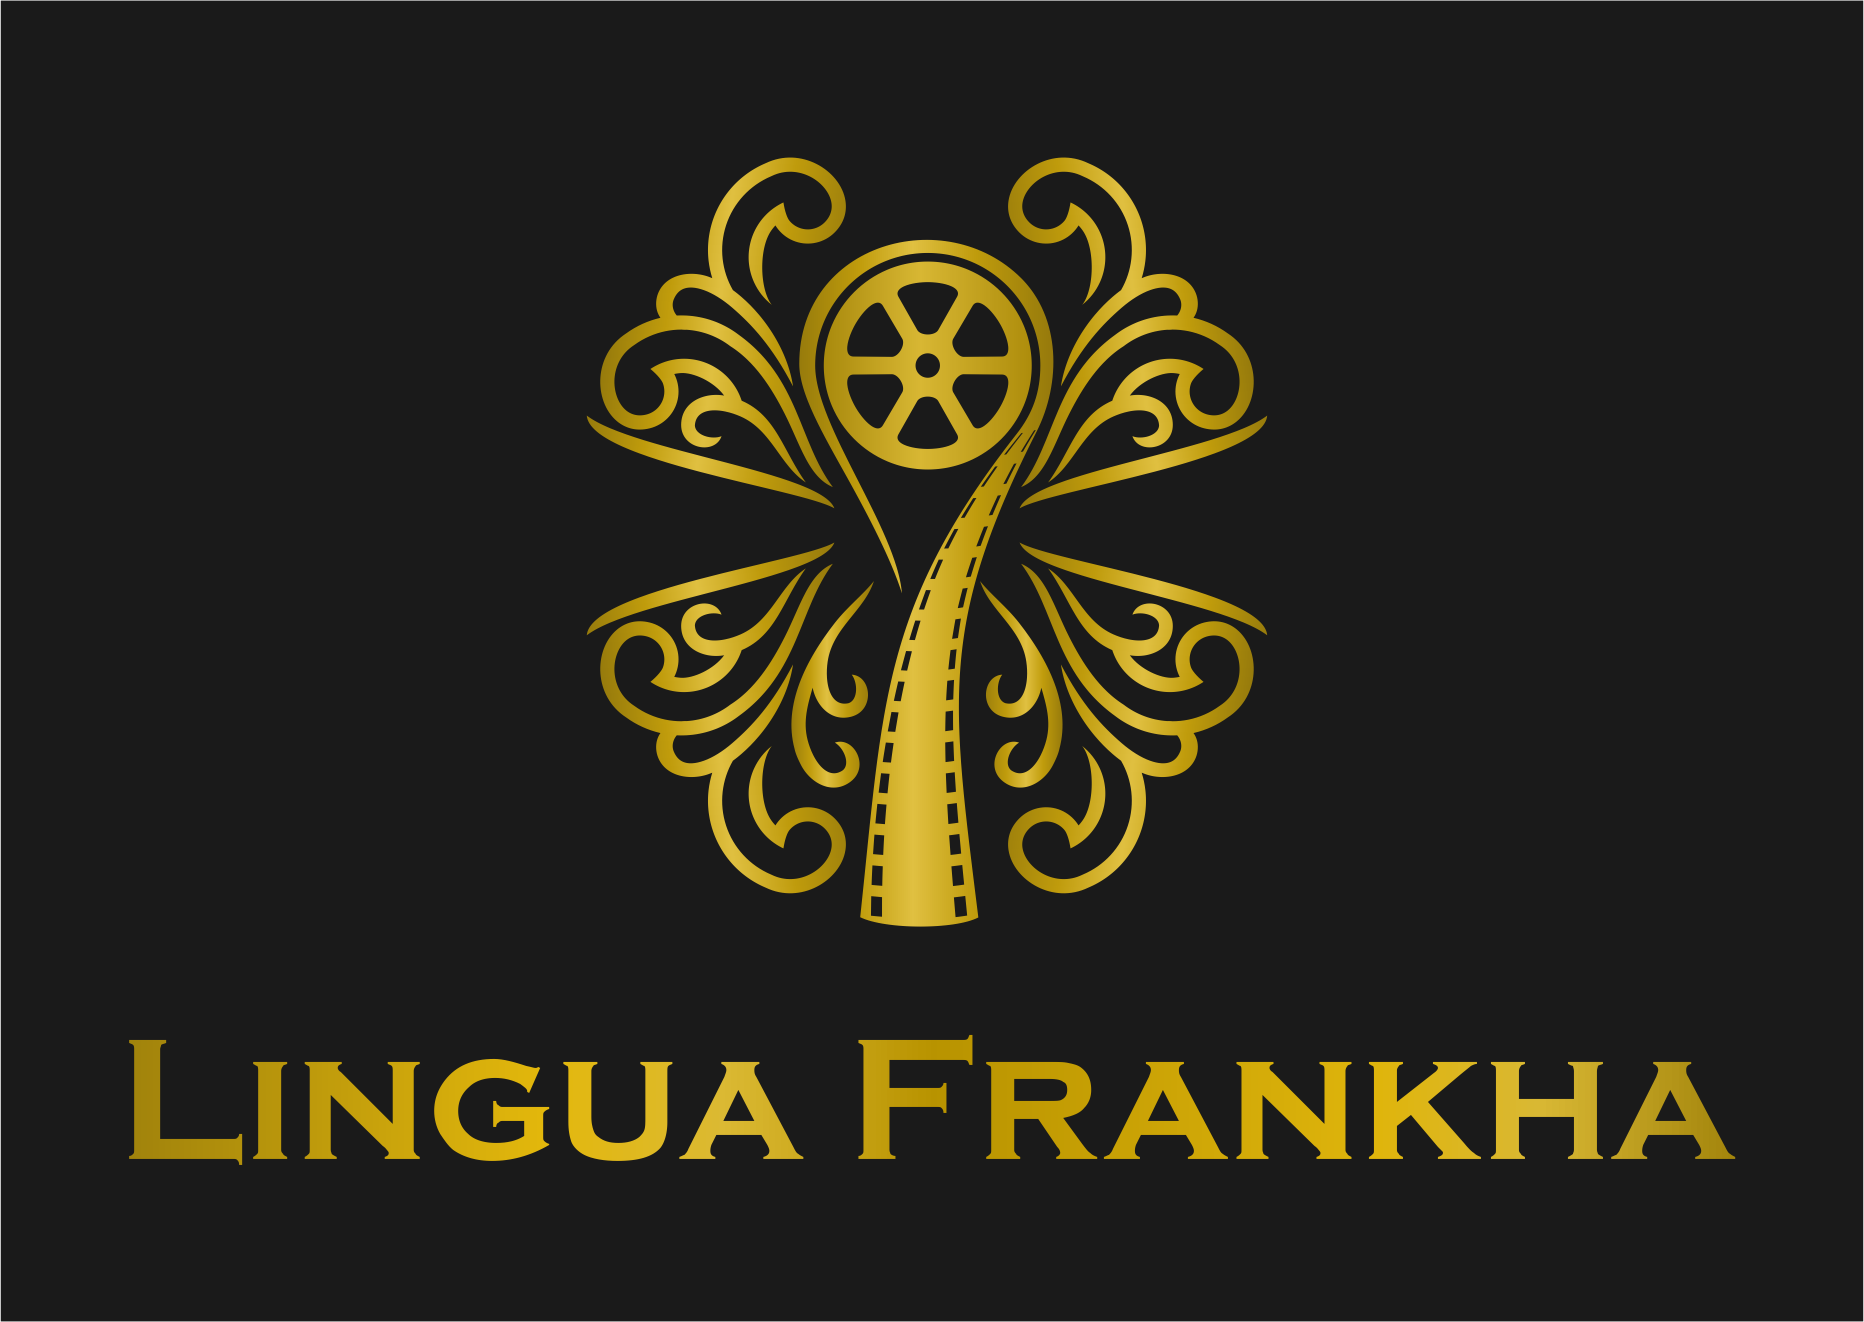 NO ANIMATE BLACK-LINGUA FRANKHA.png